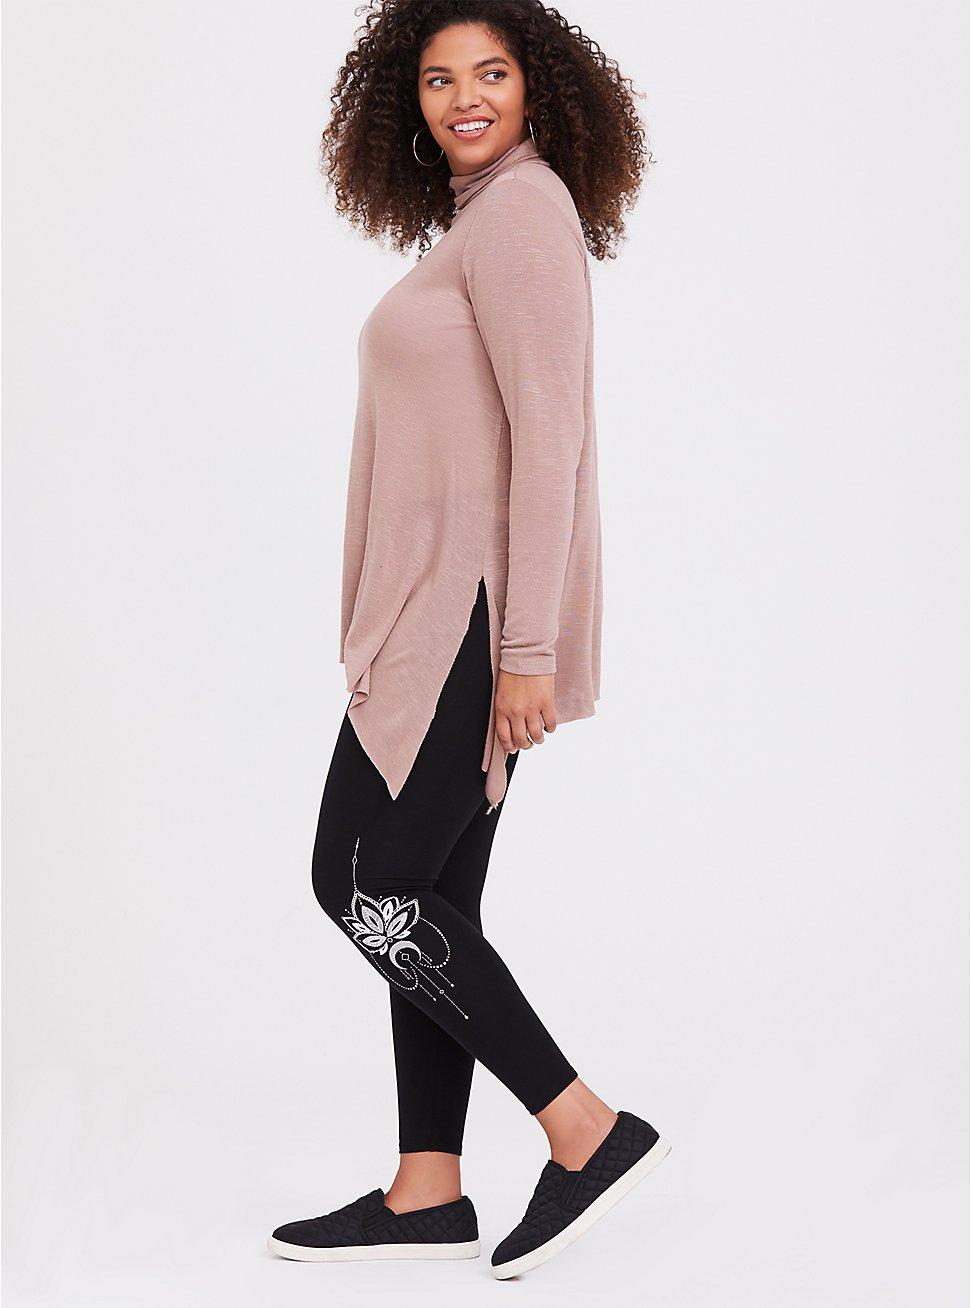 Premium Legging - Henna White & Black, BLACK, hi-res